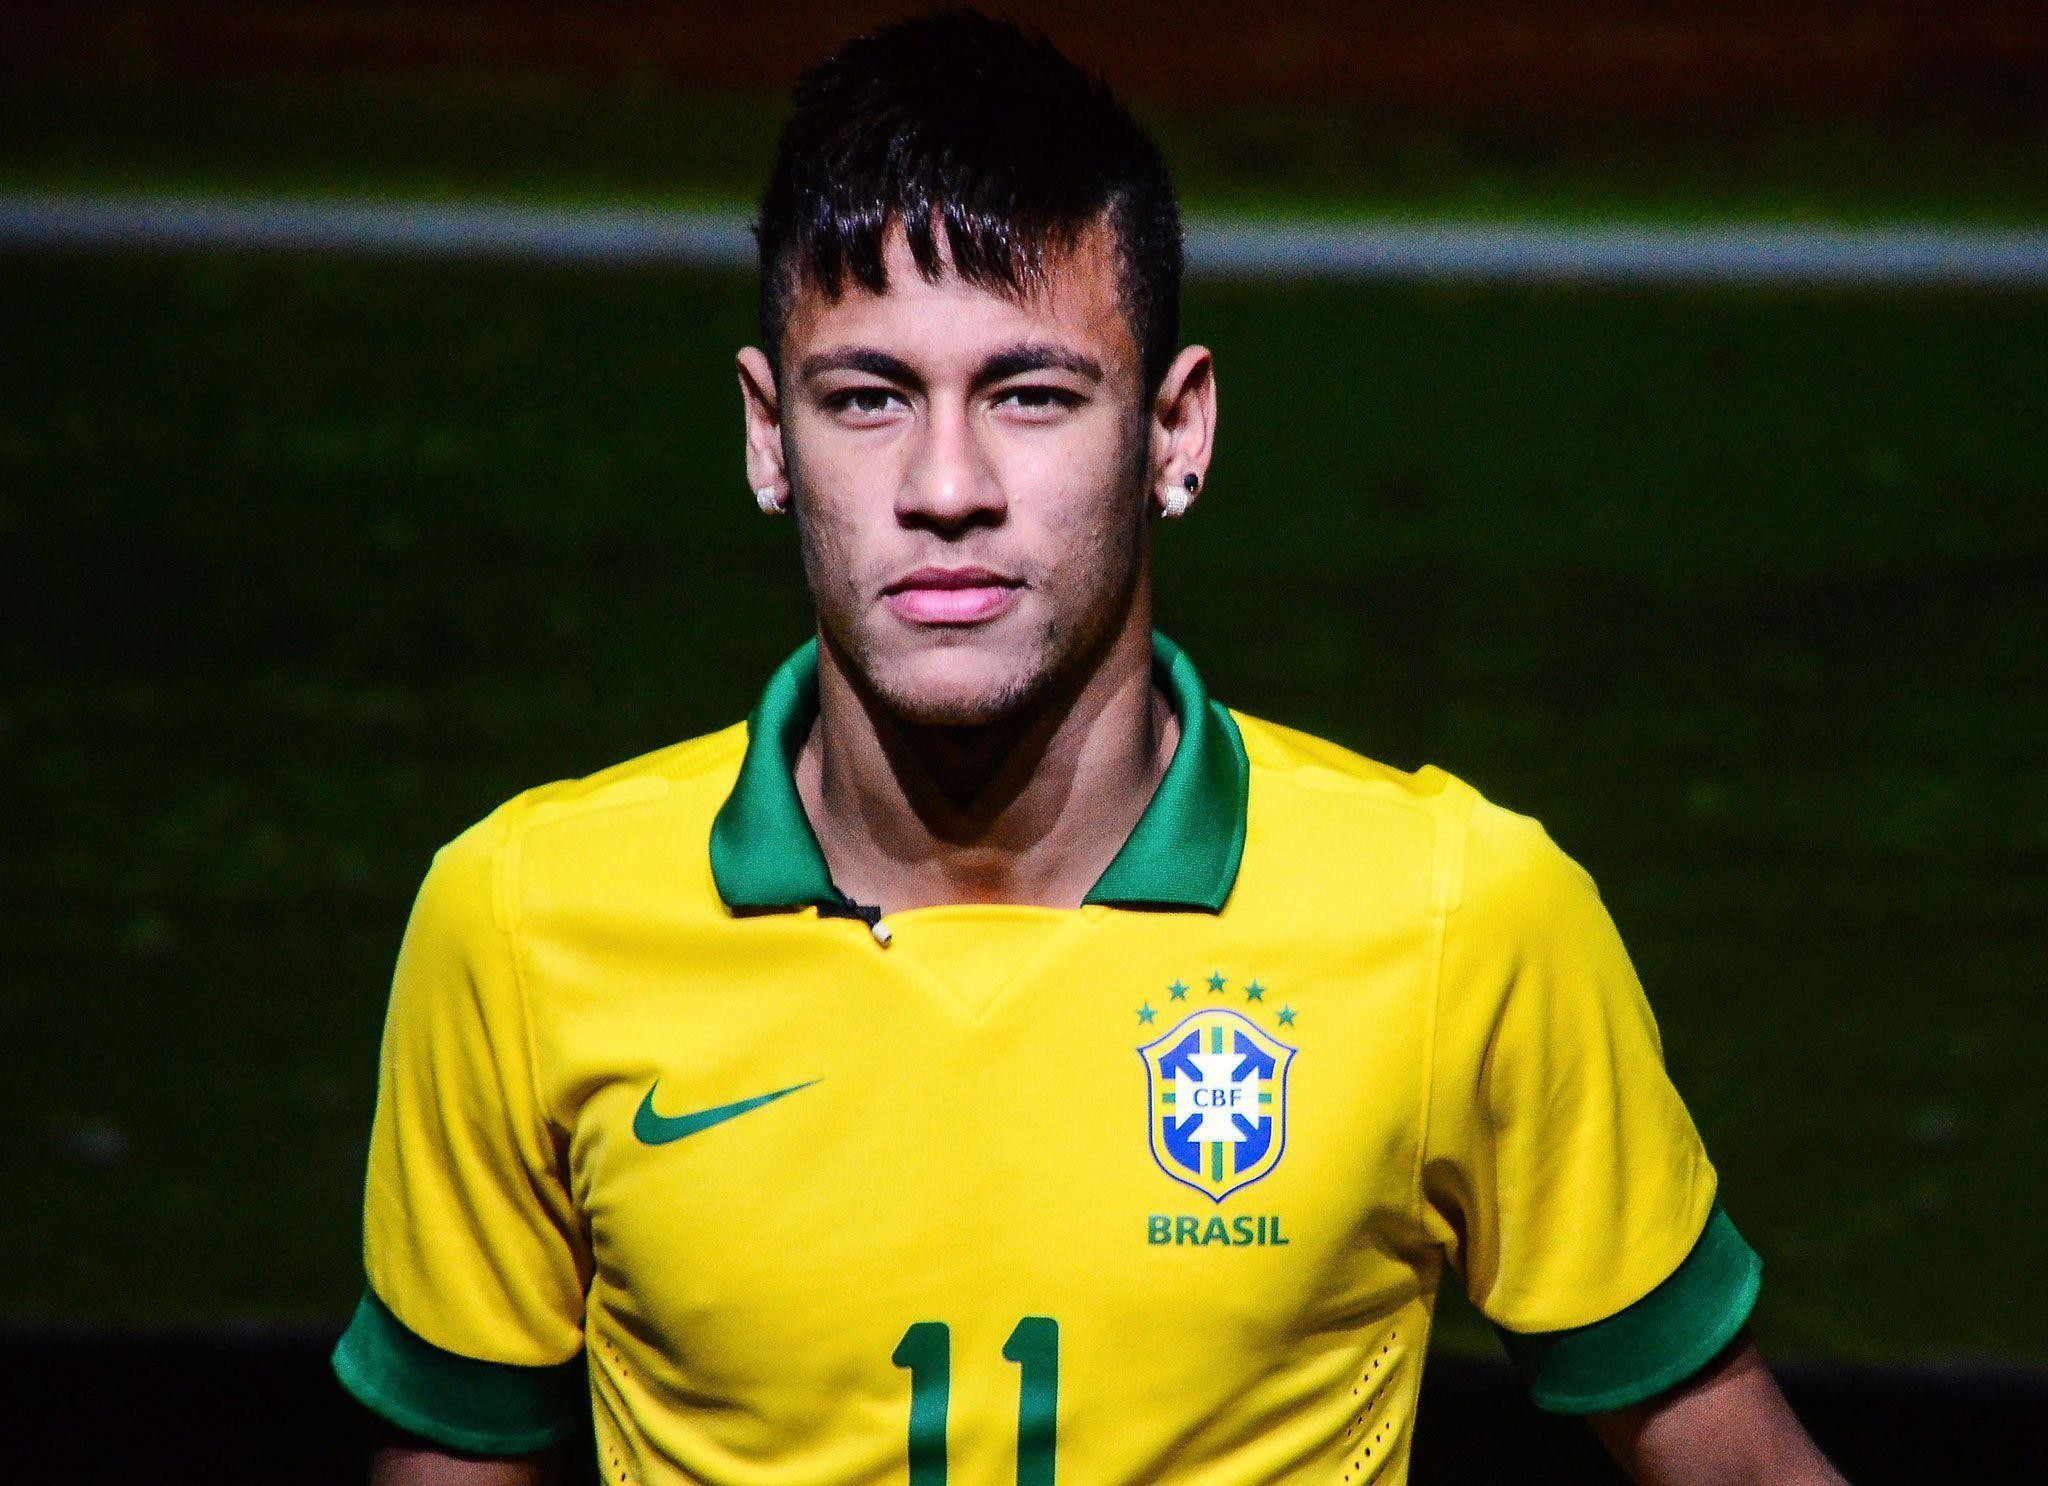 Neymar background brazil flag 2018 wallpapertag - Neymar brazil hd ...